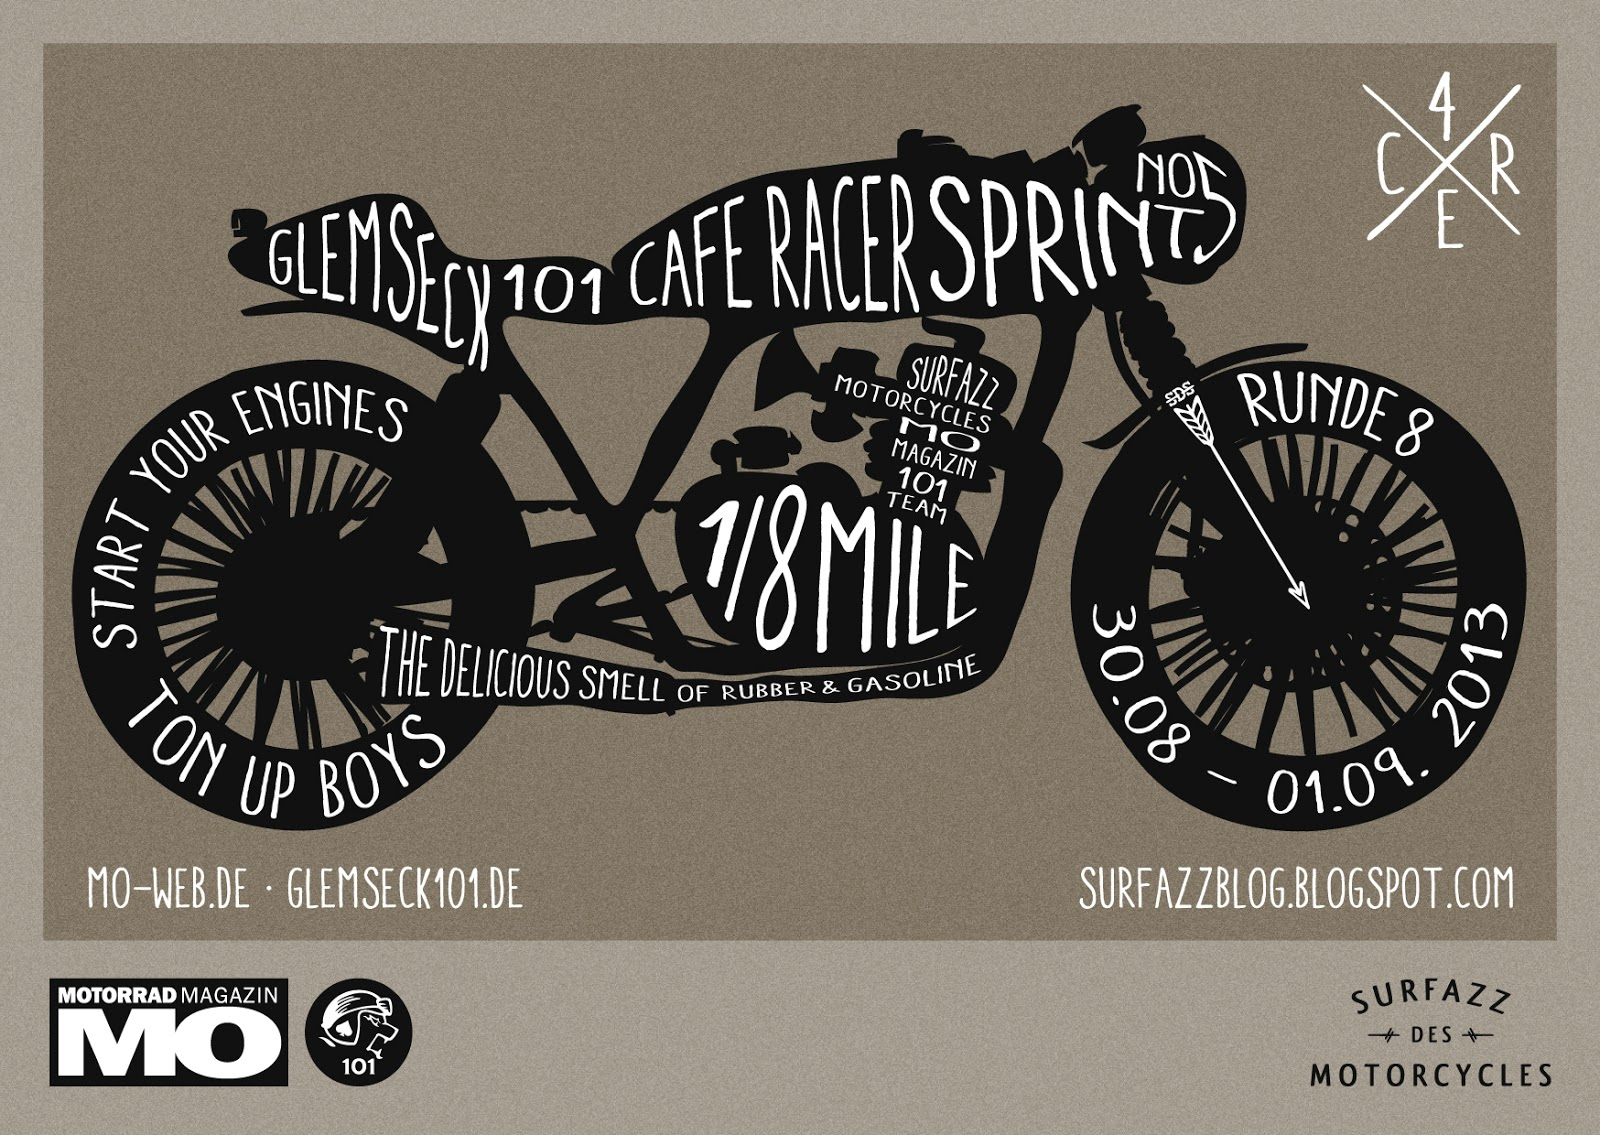 Cafe Racer Sprint 2013